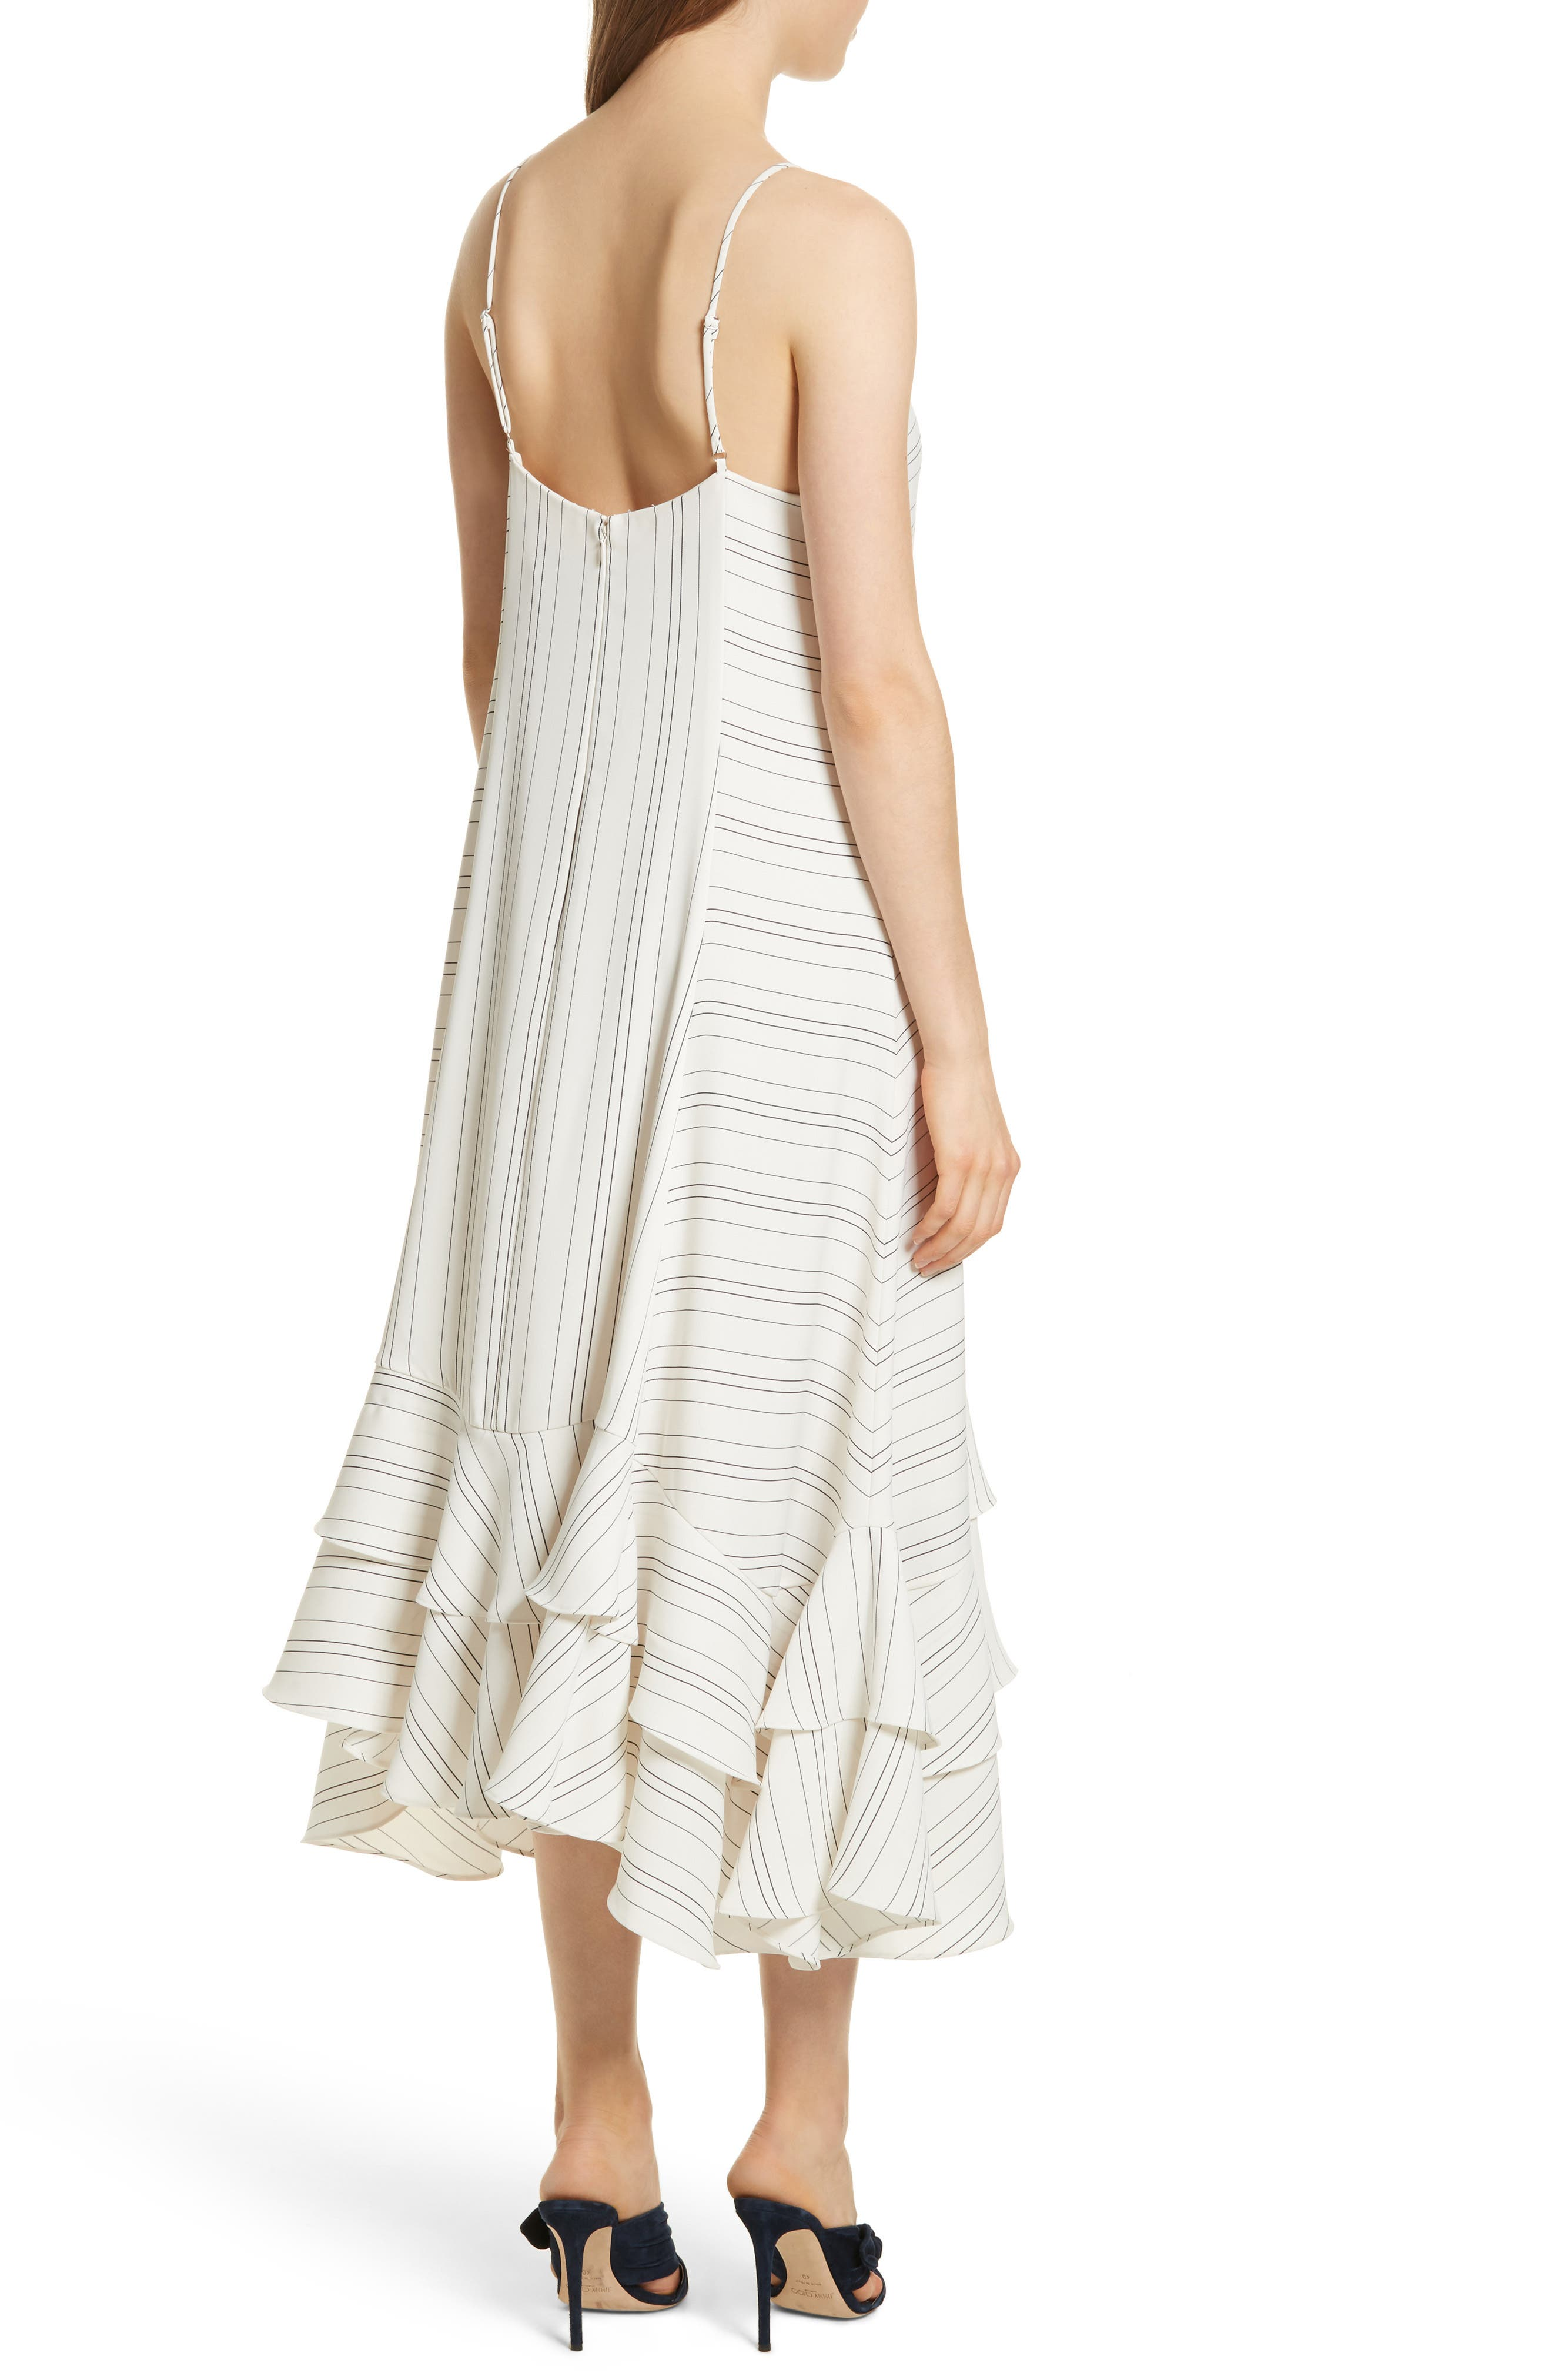 Prose & Poetry Skylar Flare Midi Dress,                             Alternate thumbnail 2, color,